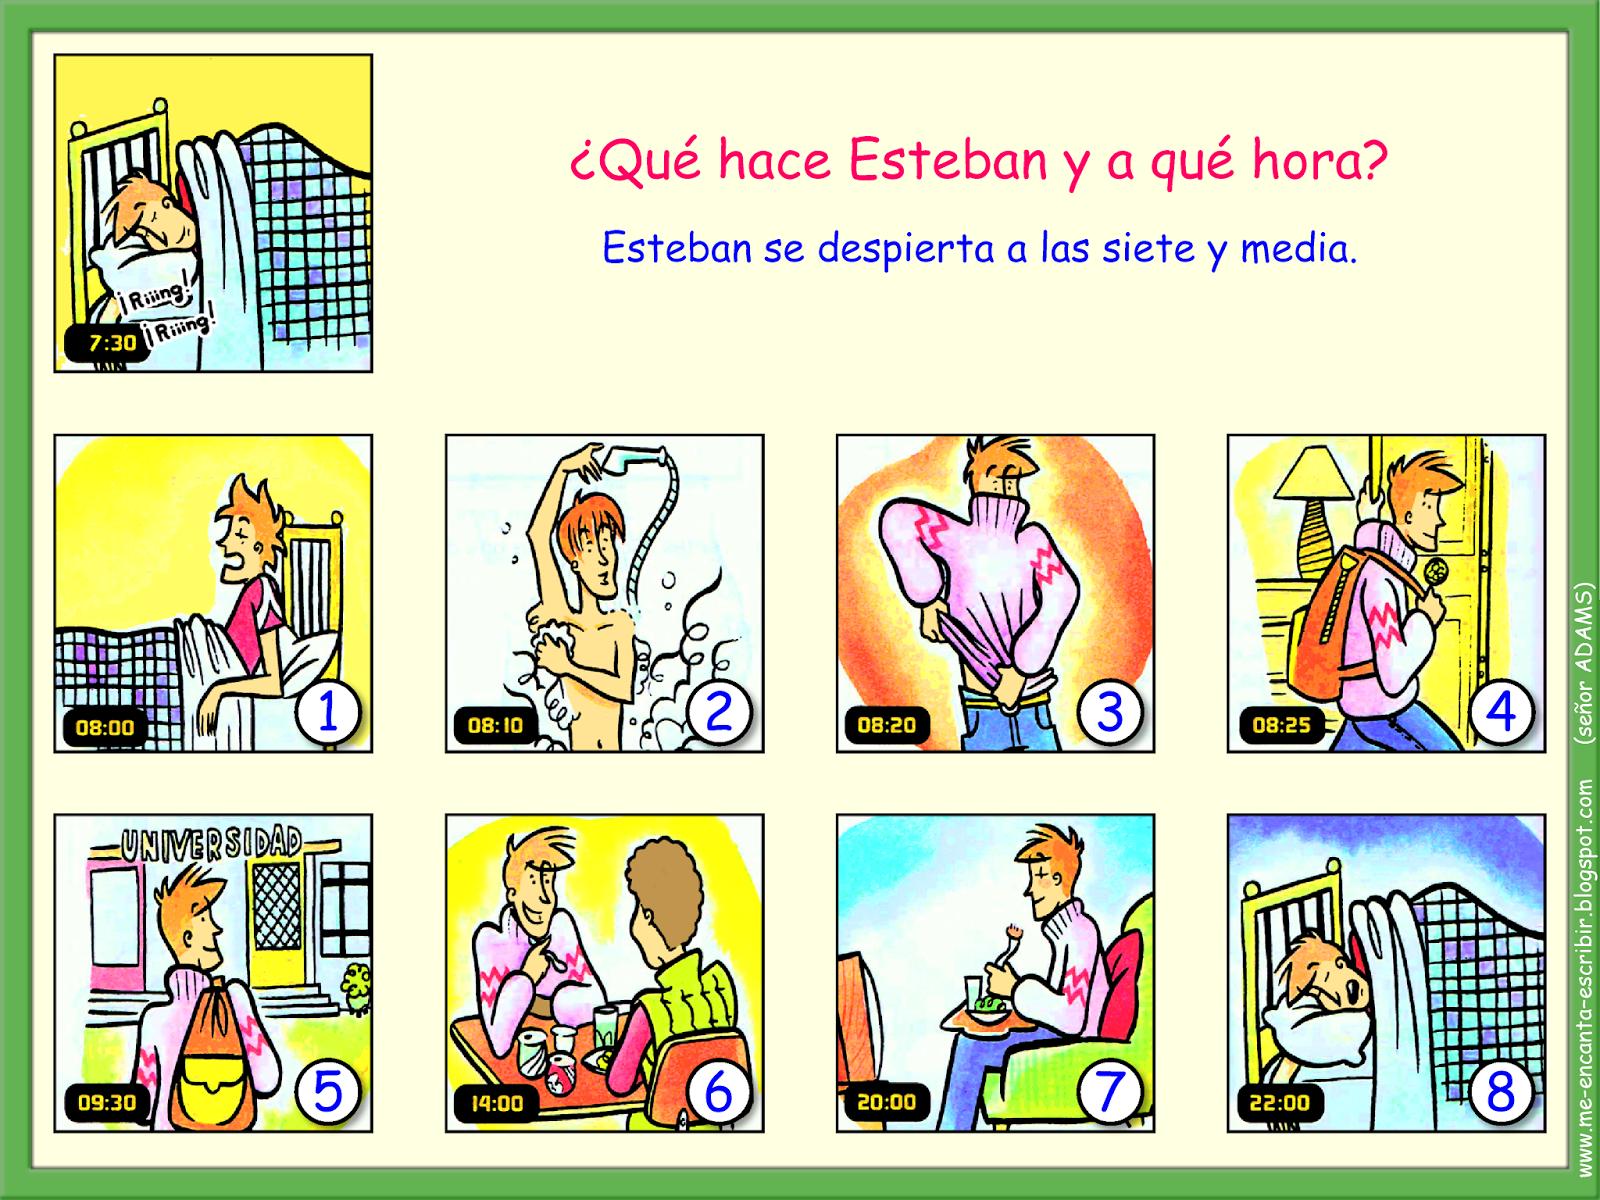 Me Encanta Escribir En Espanol La Rutina De Esteban